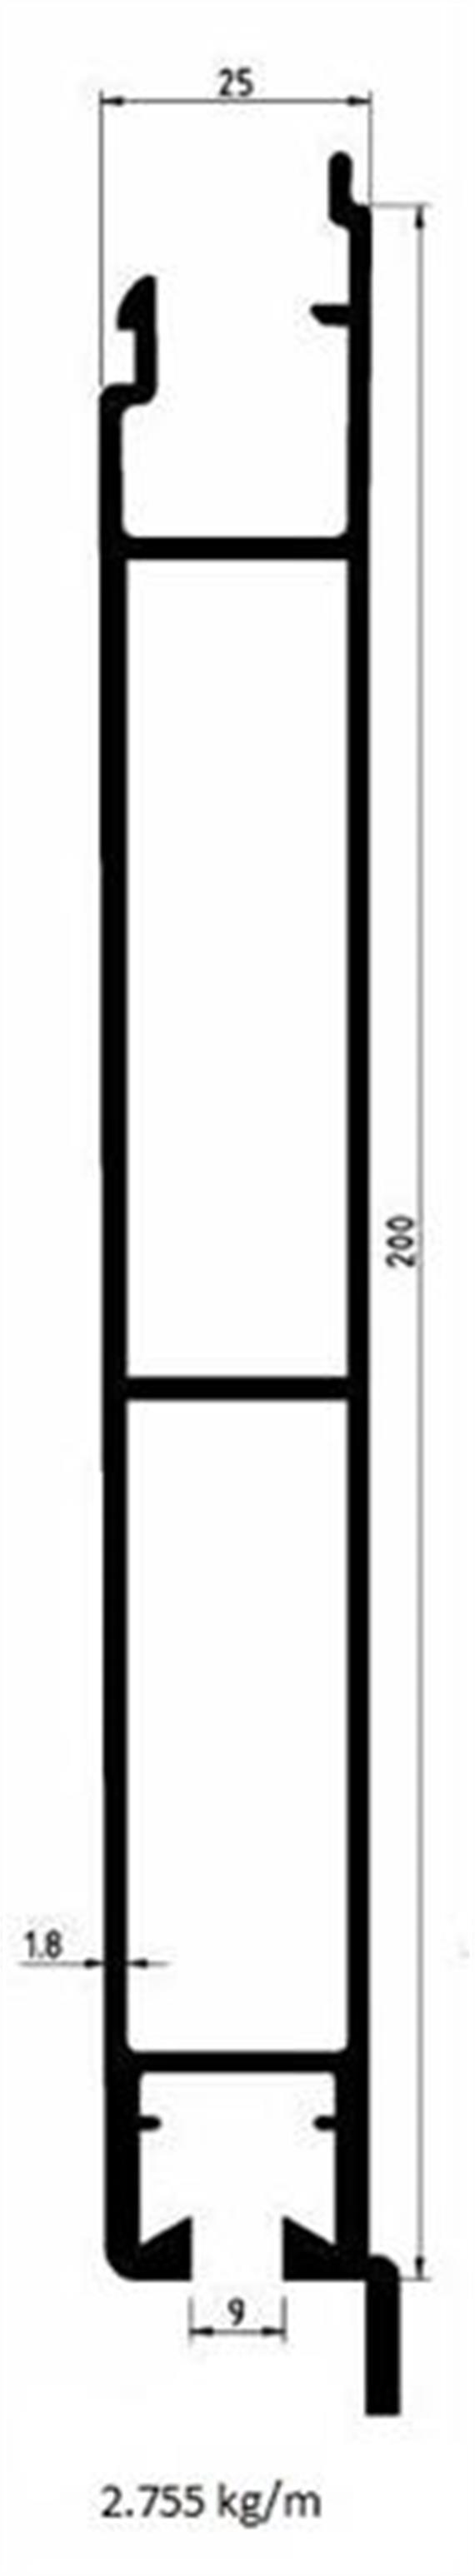 Bordwand unten 25 x 200 mit Lappen elox L=6300mm